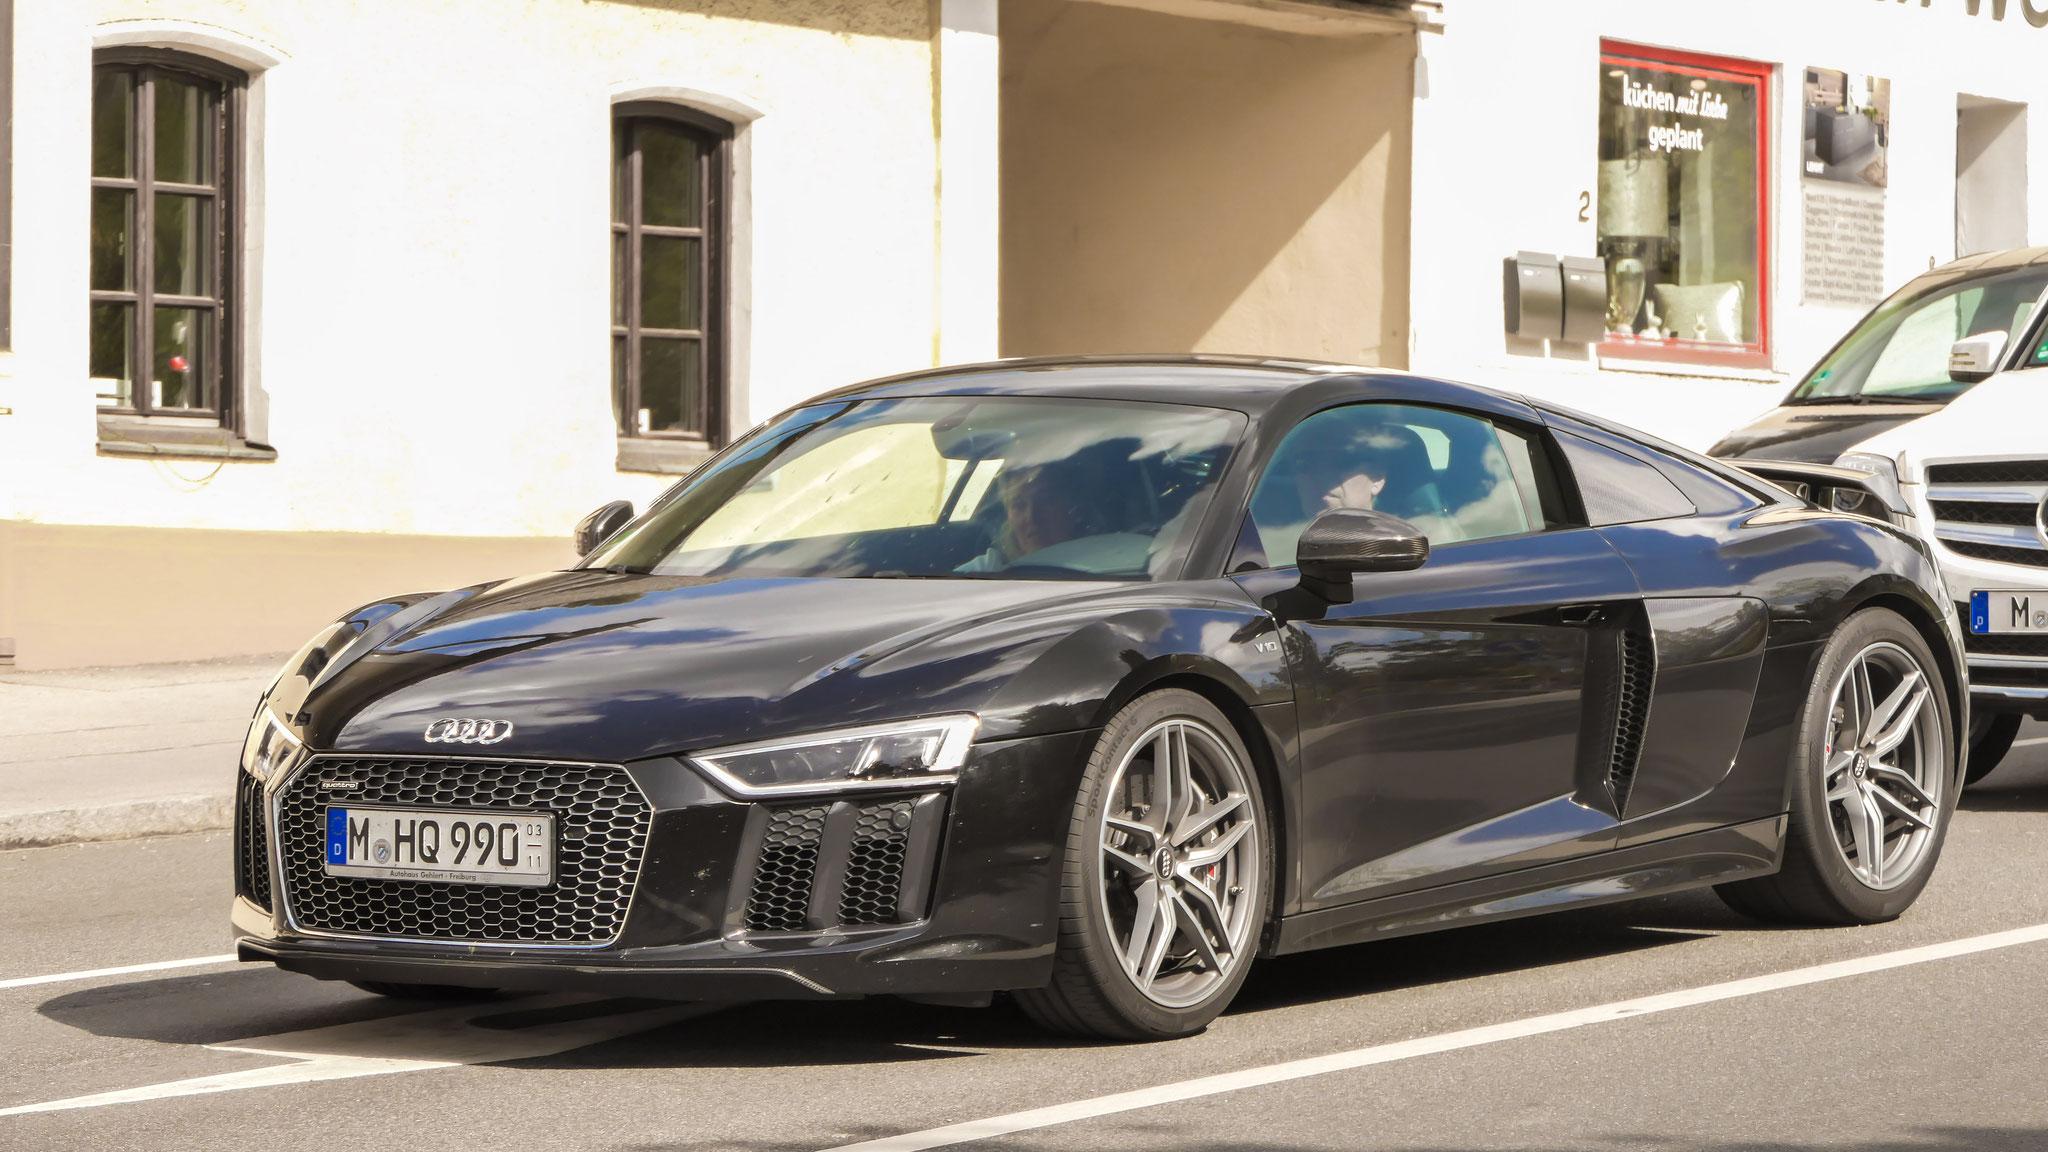 Audi R8 V10 - M-HQ-990